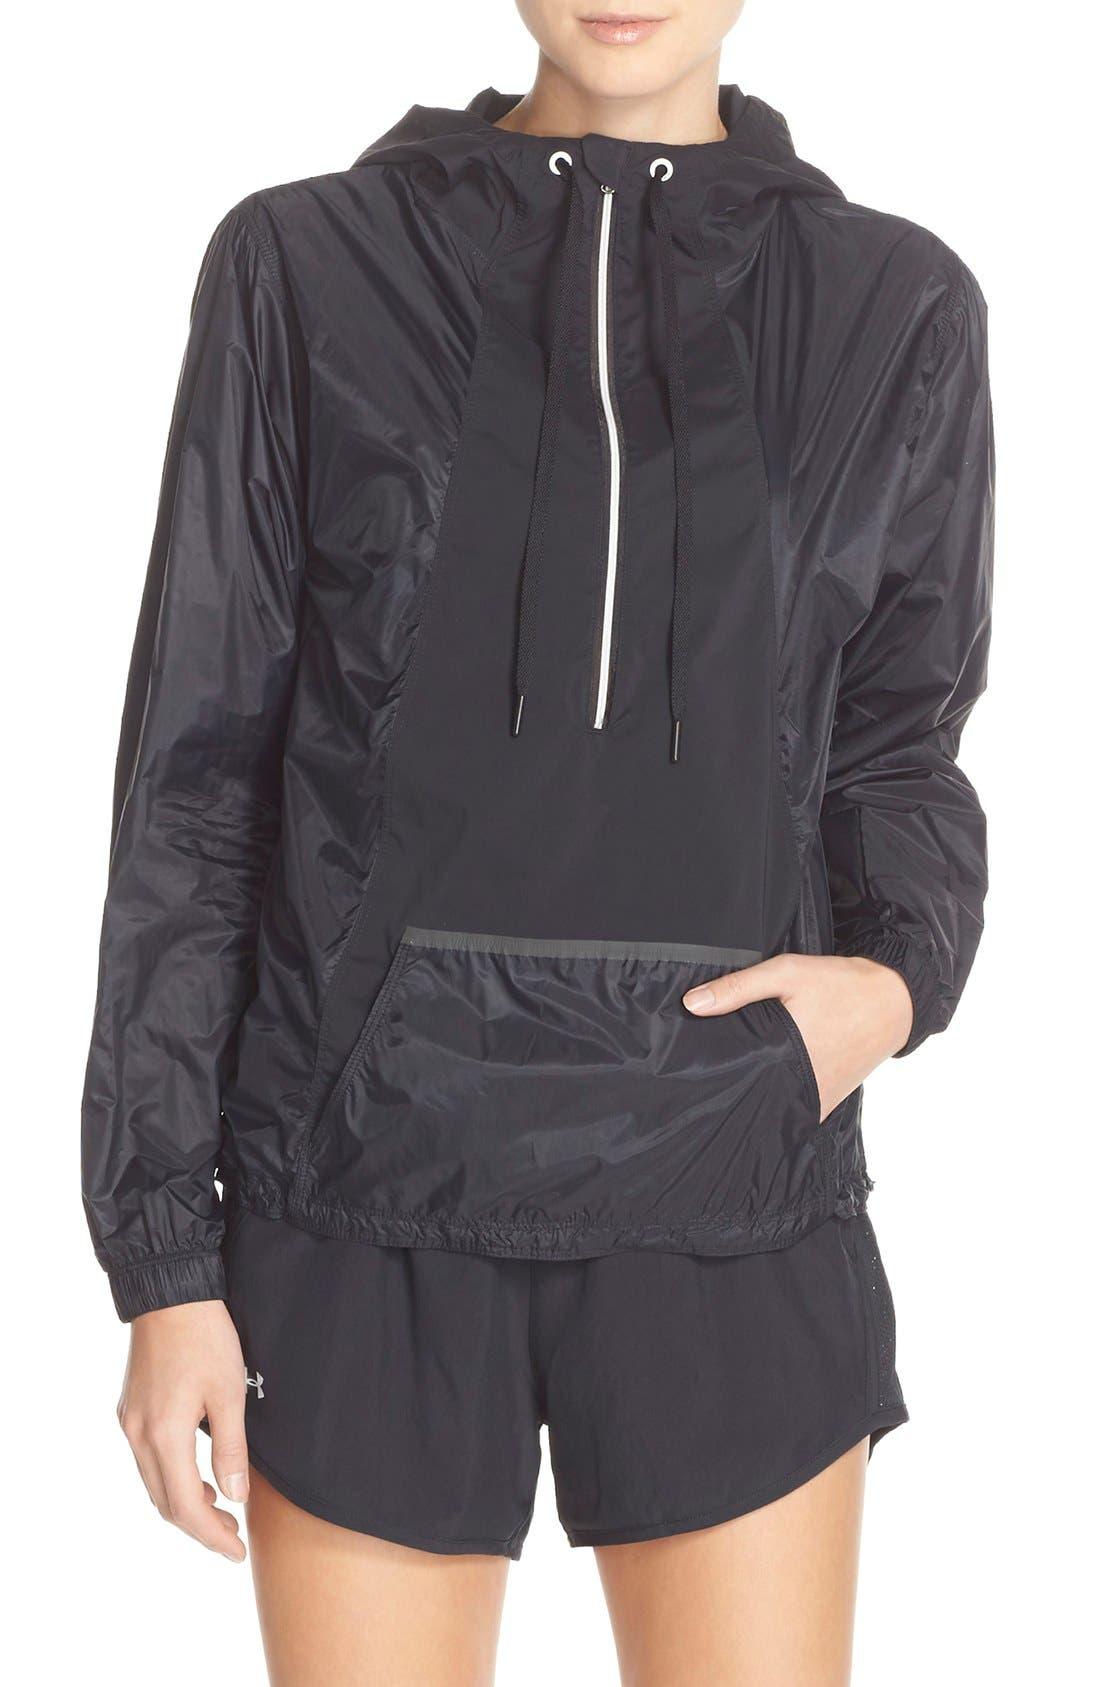 Alternate Image 1 Selected - Under Armour 'Roga' Half Zip Jacket